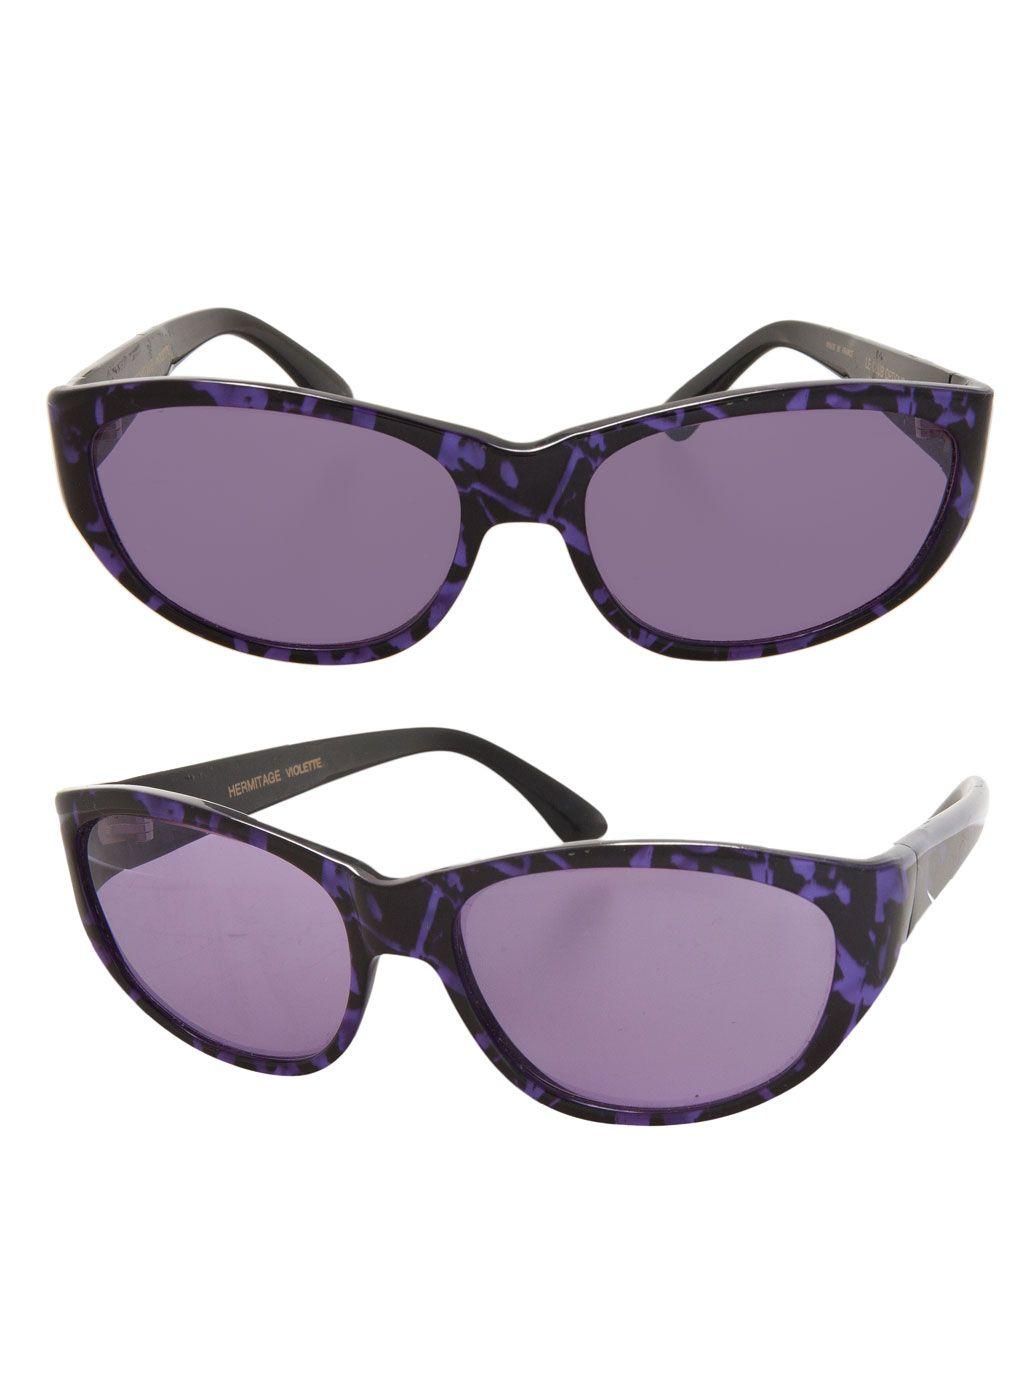 f41ea2e48 Vintage Le Club Optique Marbled Purple Sunglasses - American Apparel ...